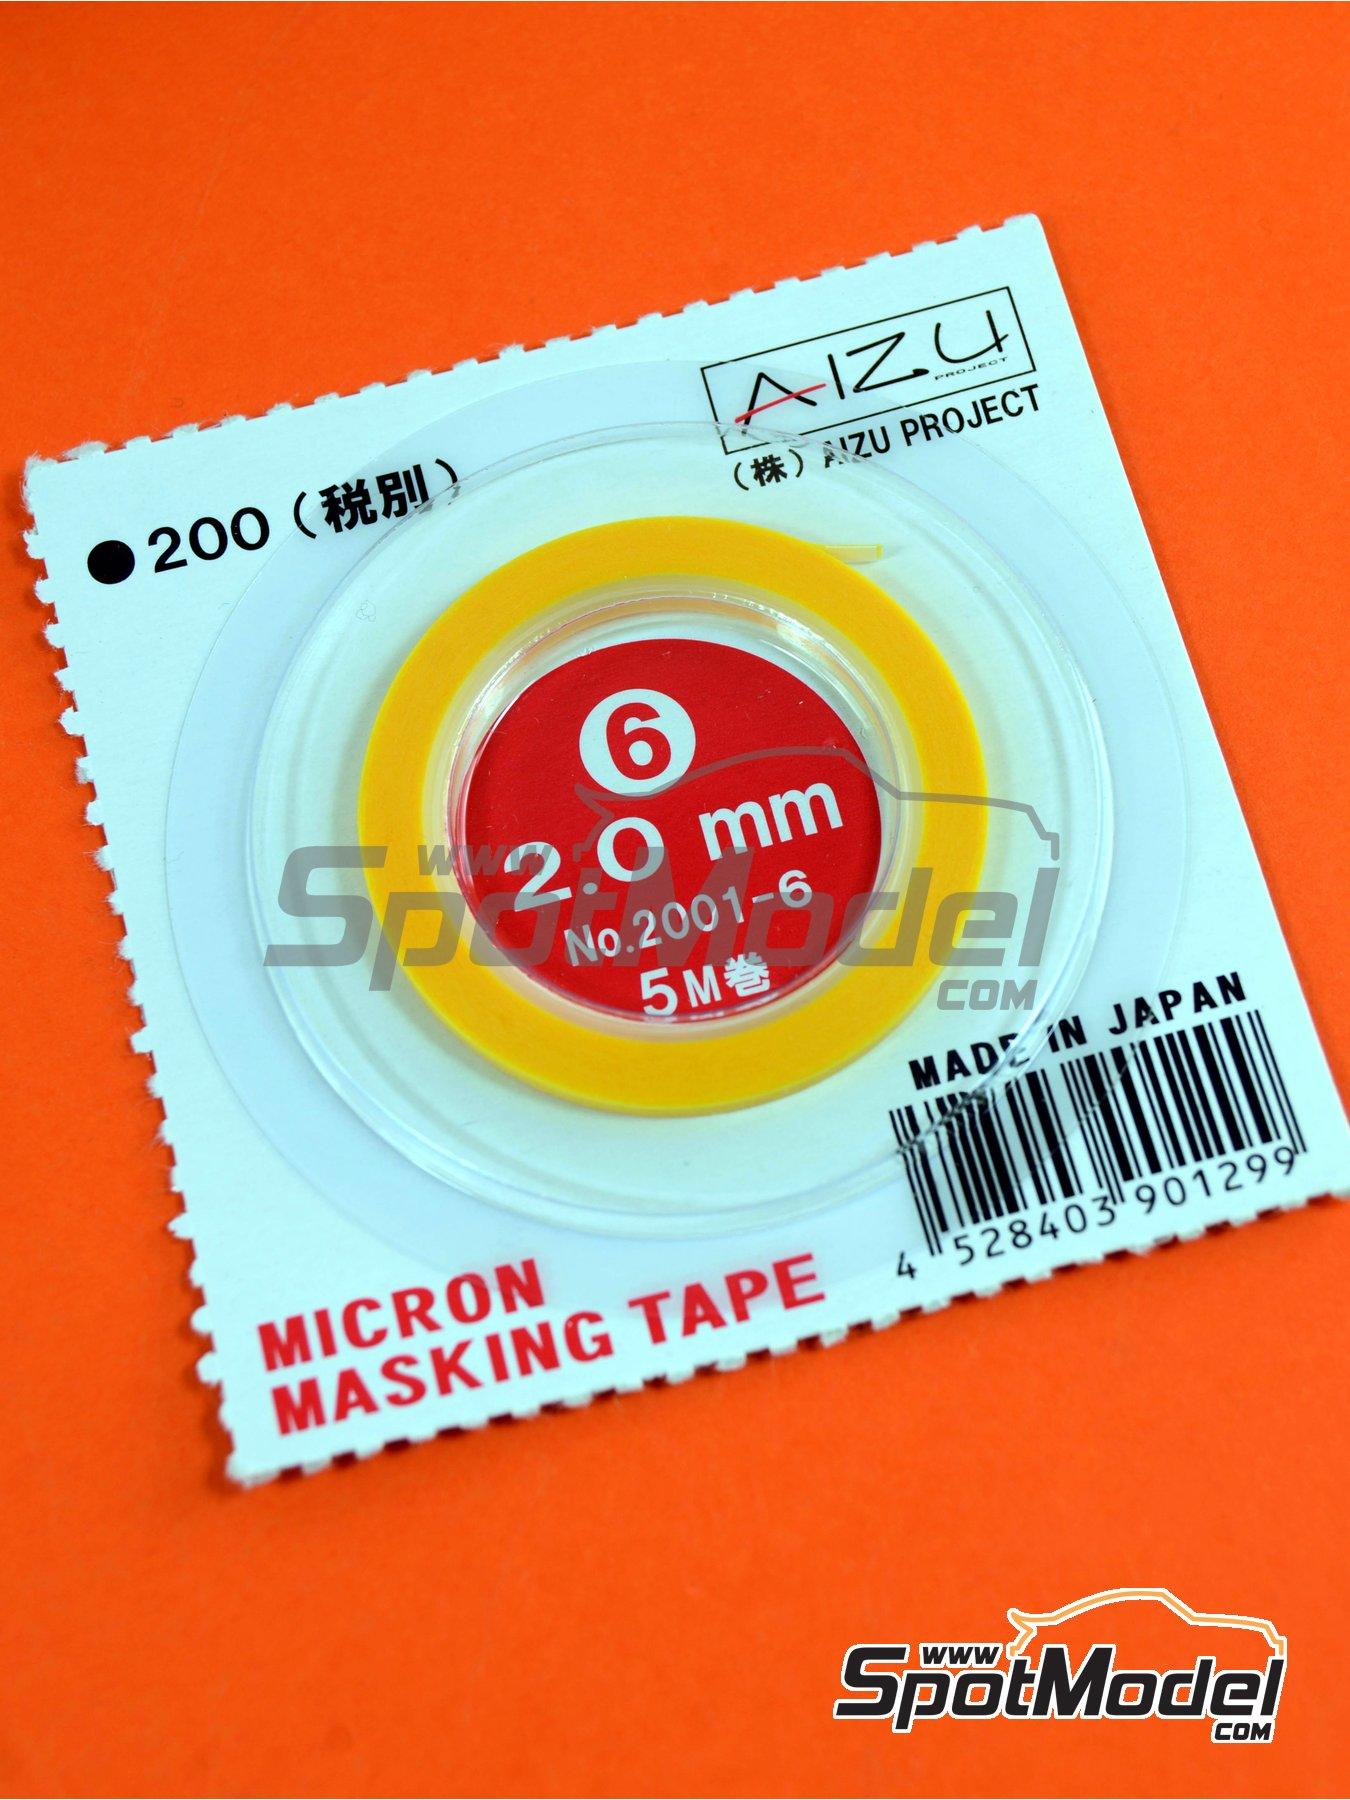 Micron masking tape 2,0mm x 5m | Masks manufactured by Aizu Project (ref.AIZU-2001-6) image